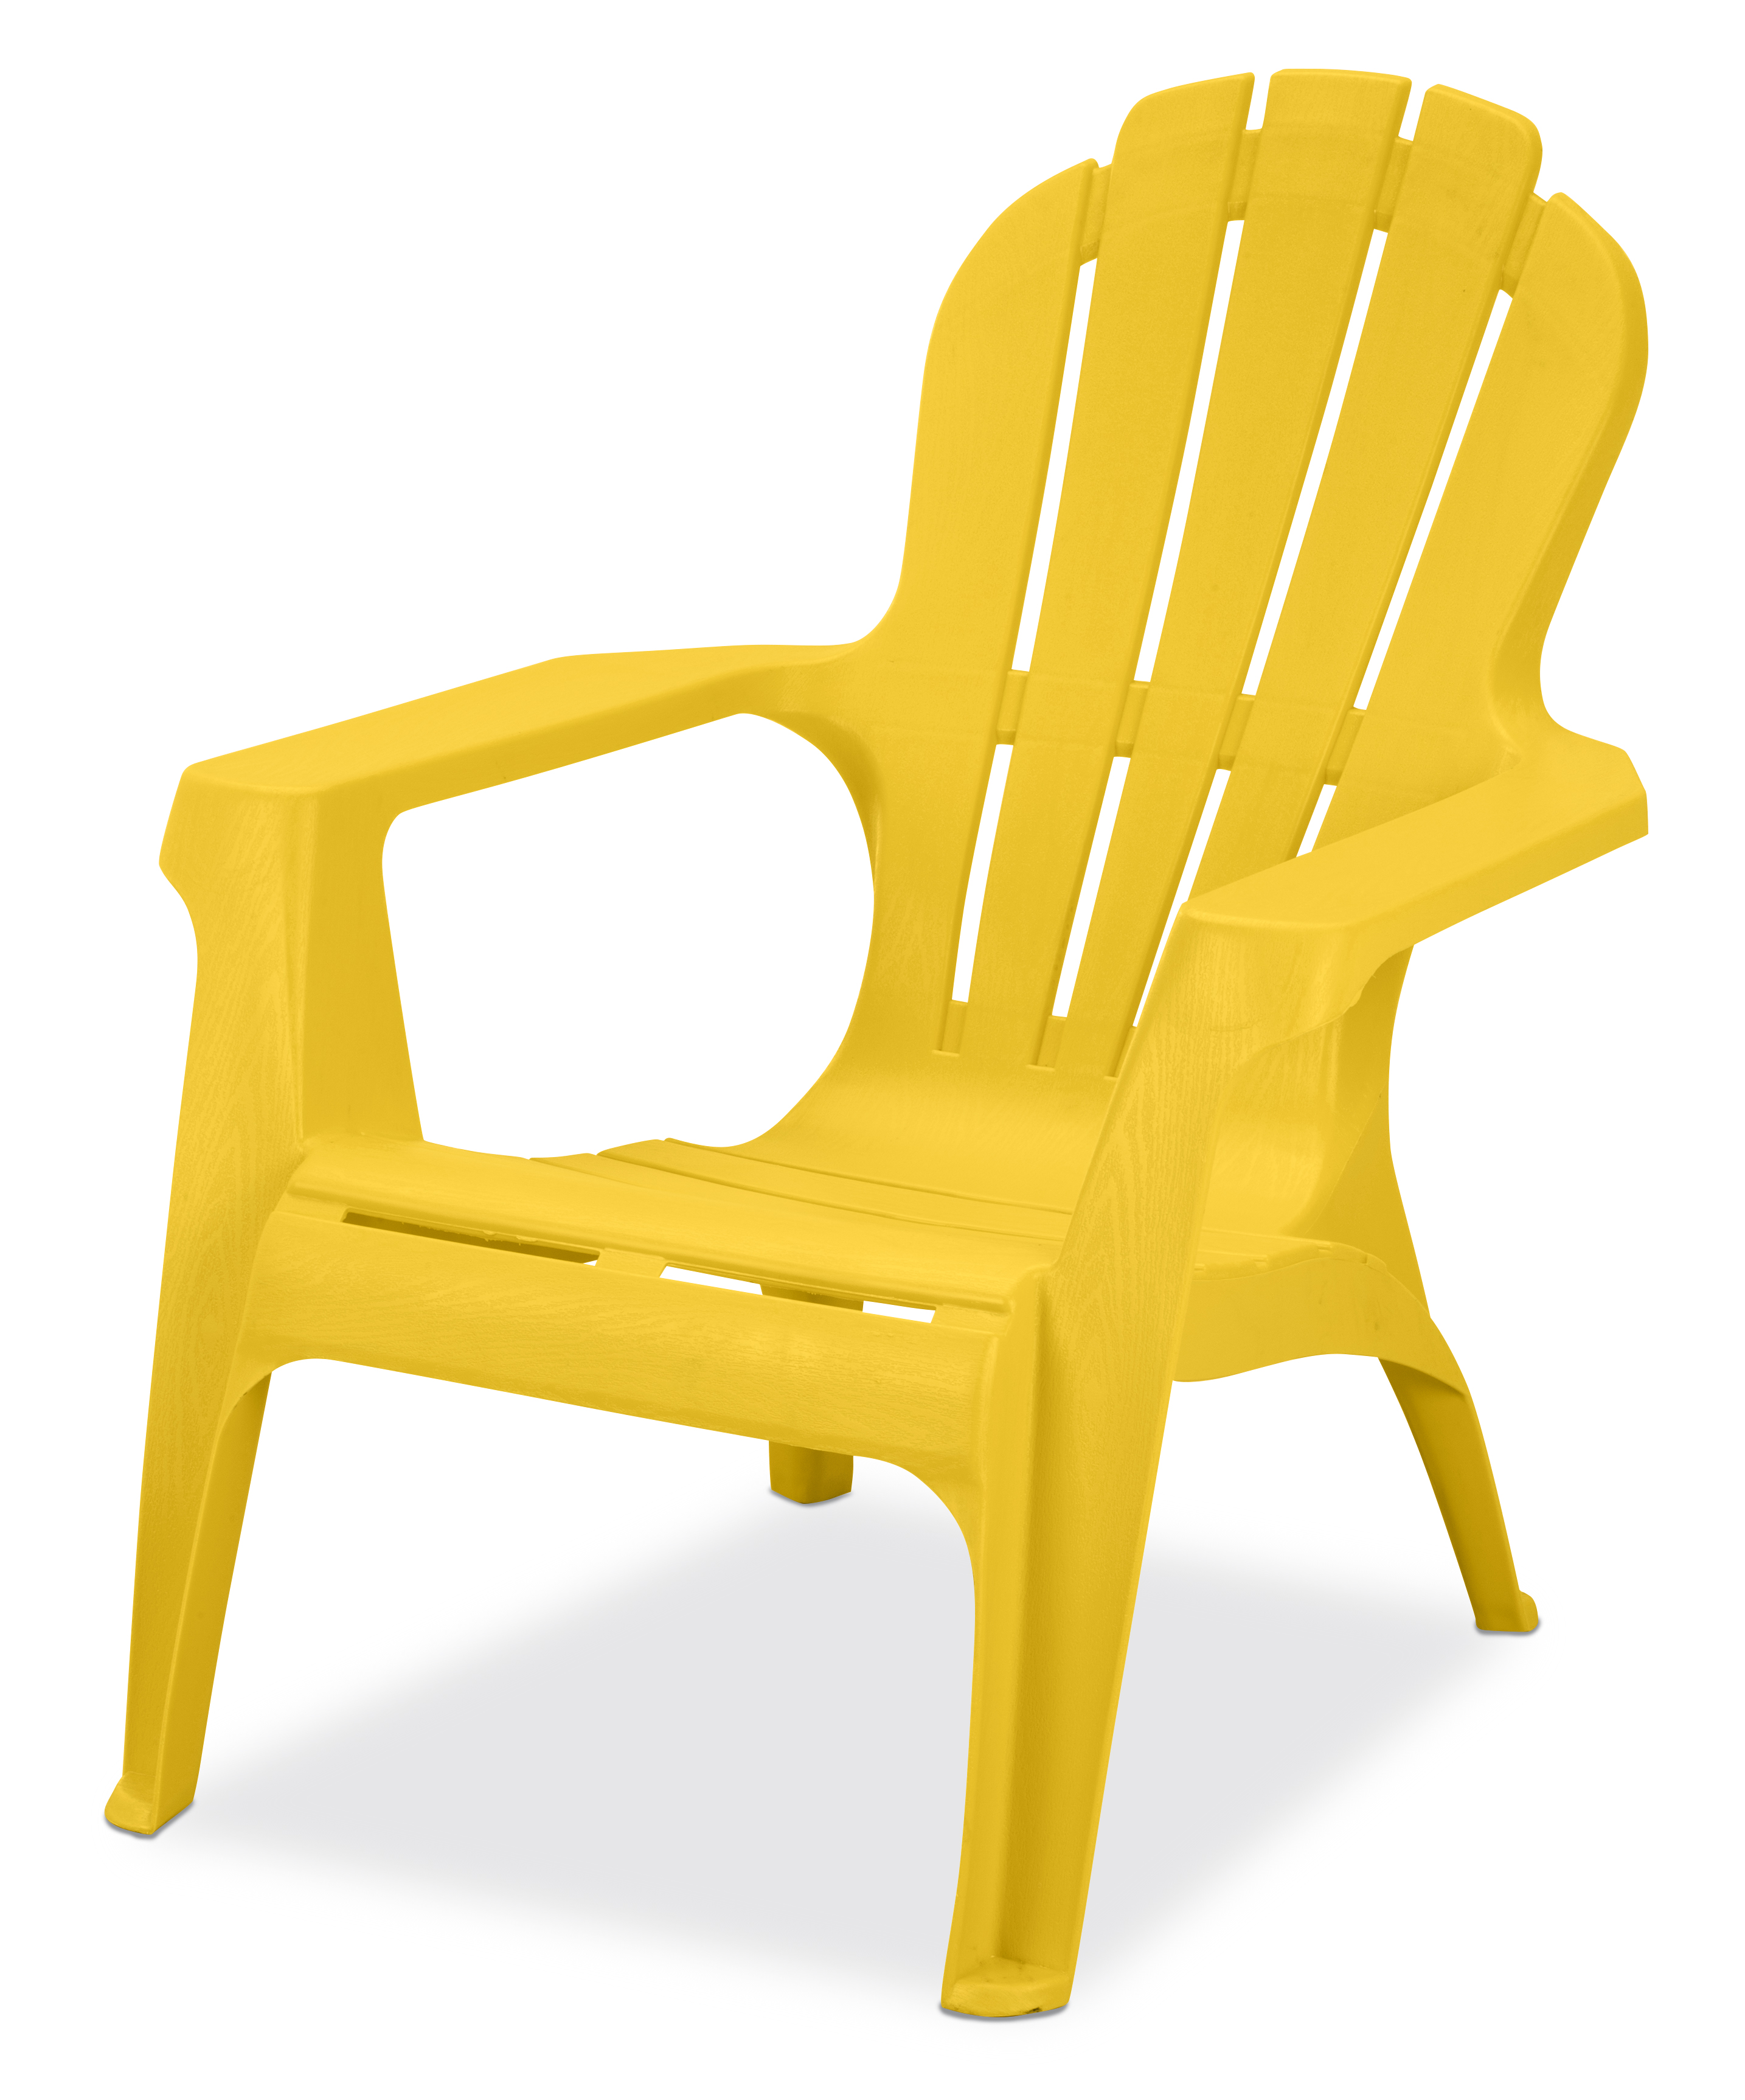 us leisure resin adirondack plastic patio furniture chair yellow